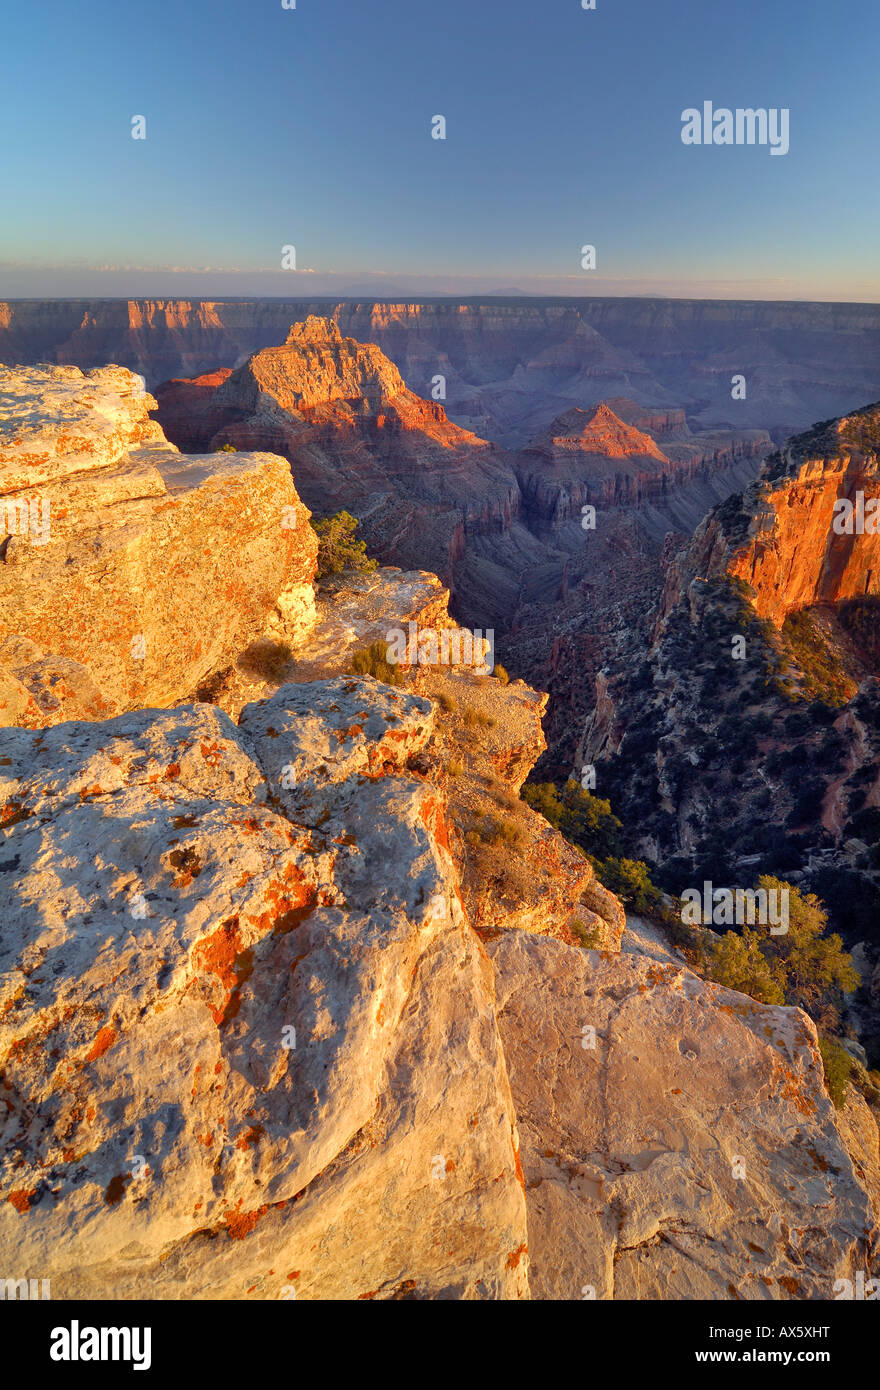 Cape Royal, North Rim, Grand Canyon National Park, Arizona, USA, North America - Stock Image